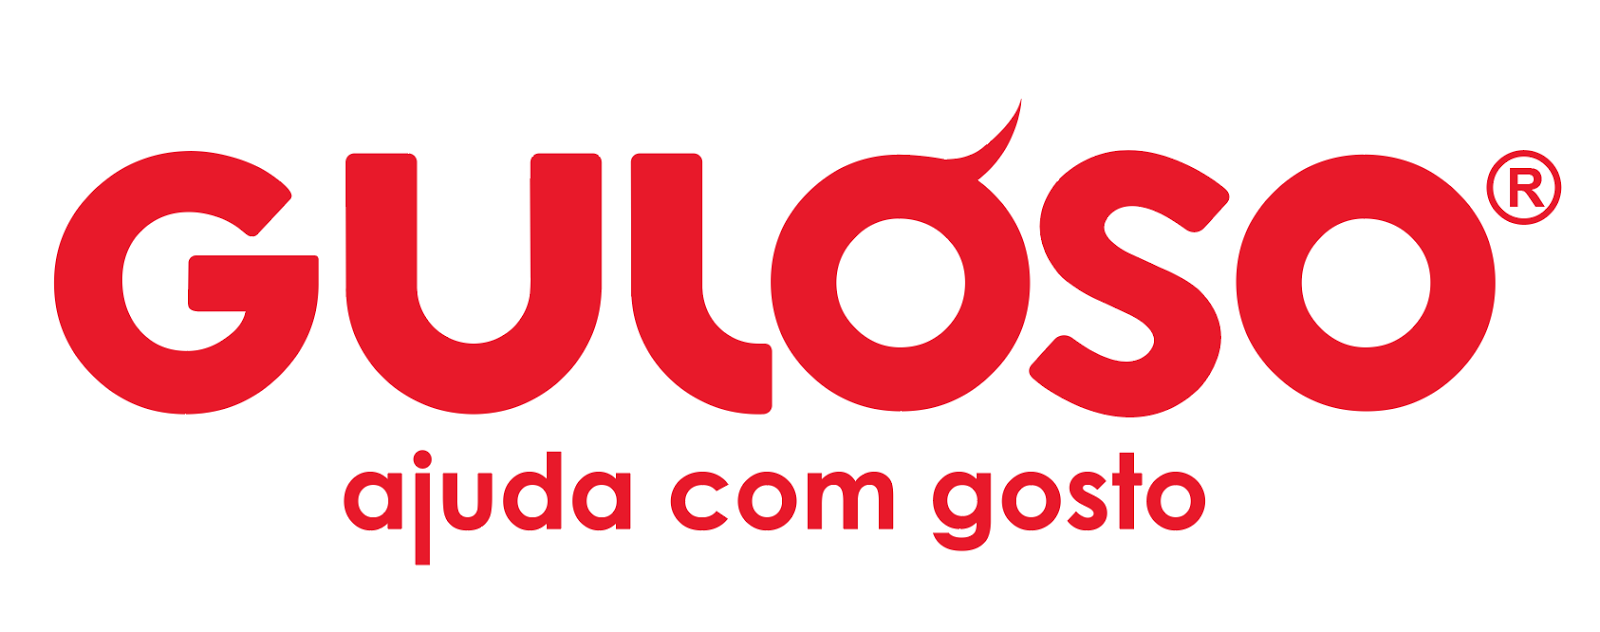 Embaixadora Guloso